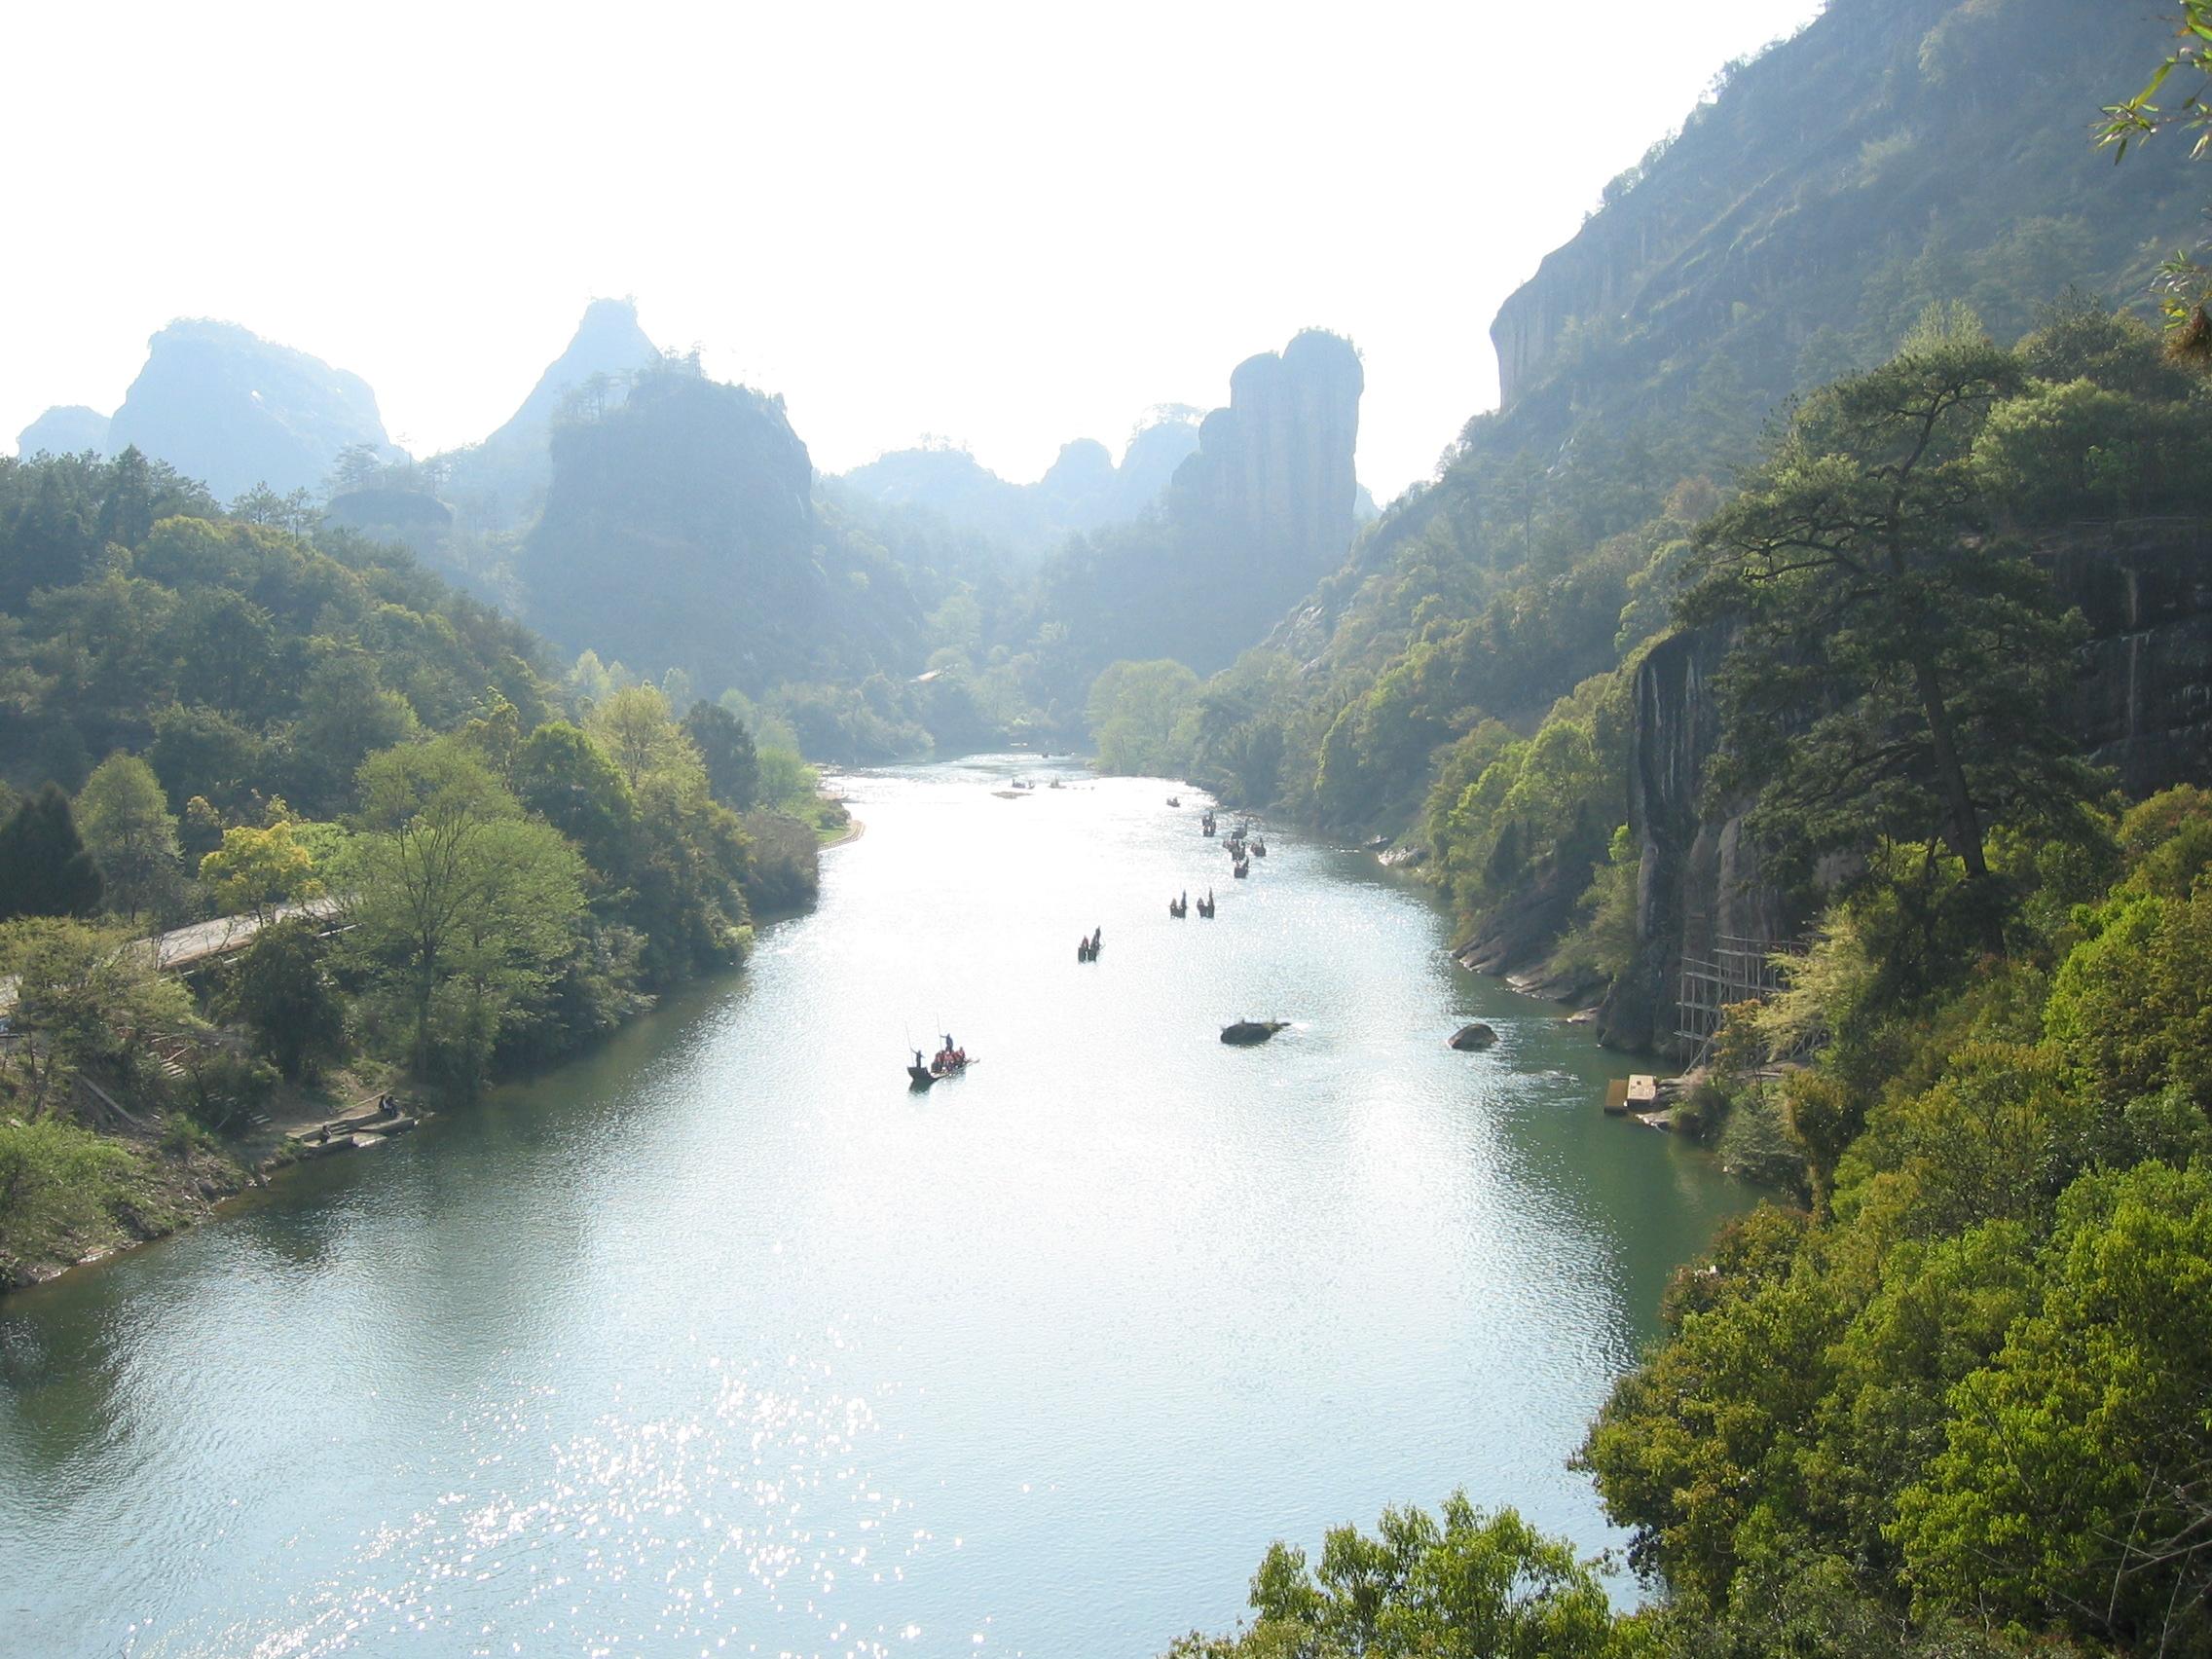 Nio krökars flod vid Wuyishan